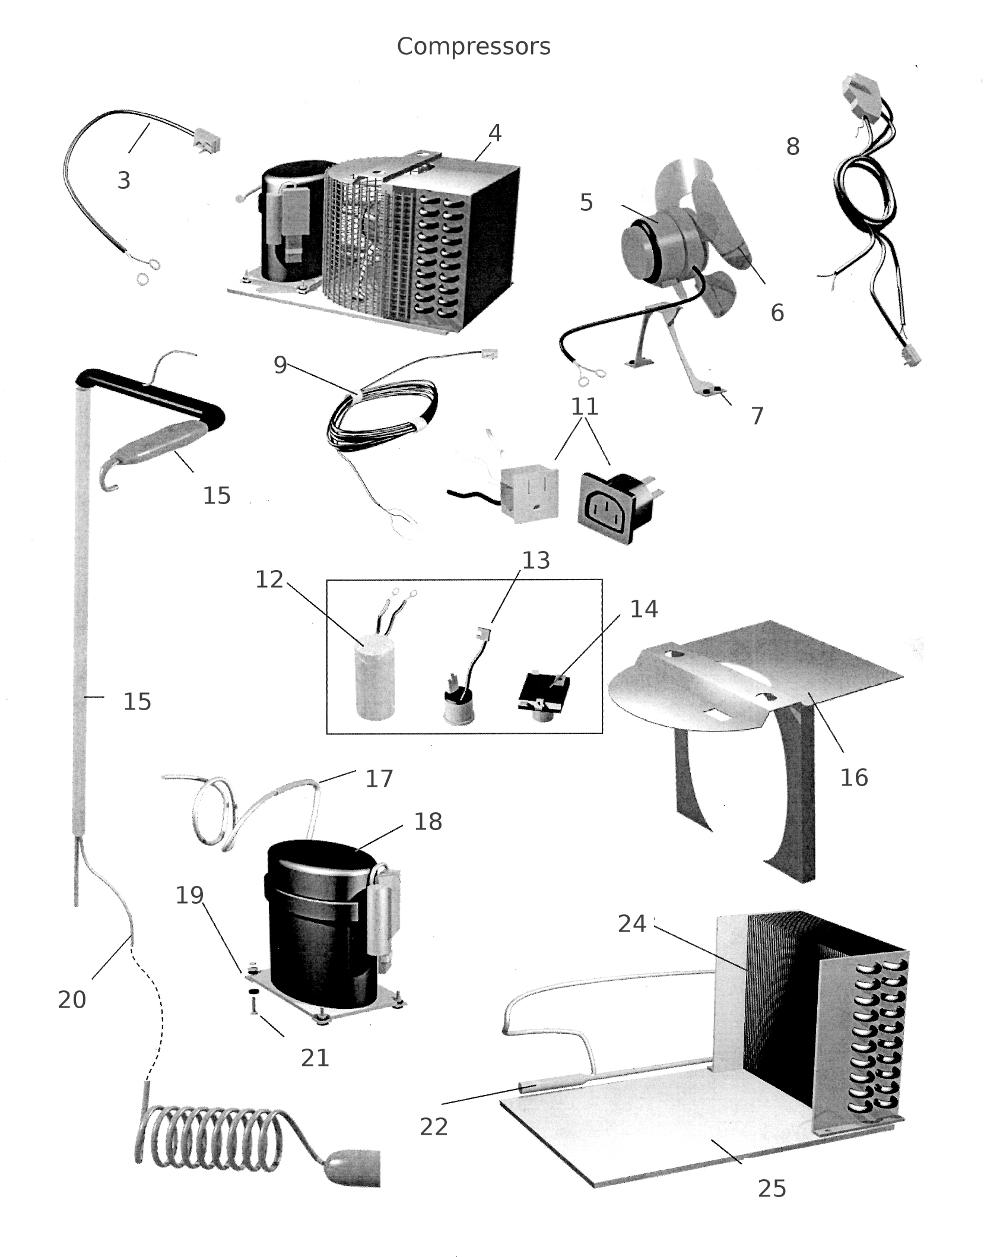 1925 model t ford wiring diagram science diagrams of class 10 true 19f www toyskids co freezer 23f 33 a